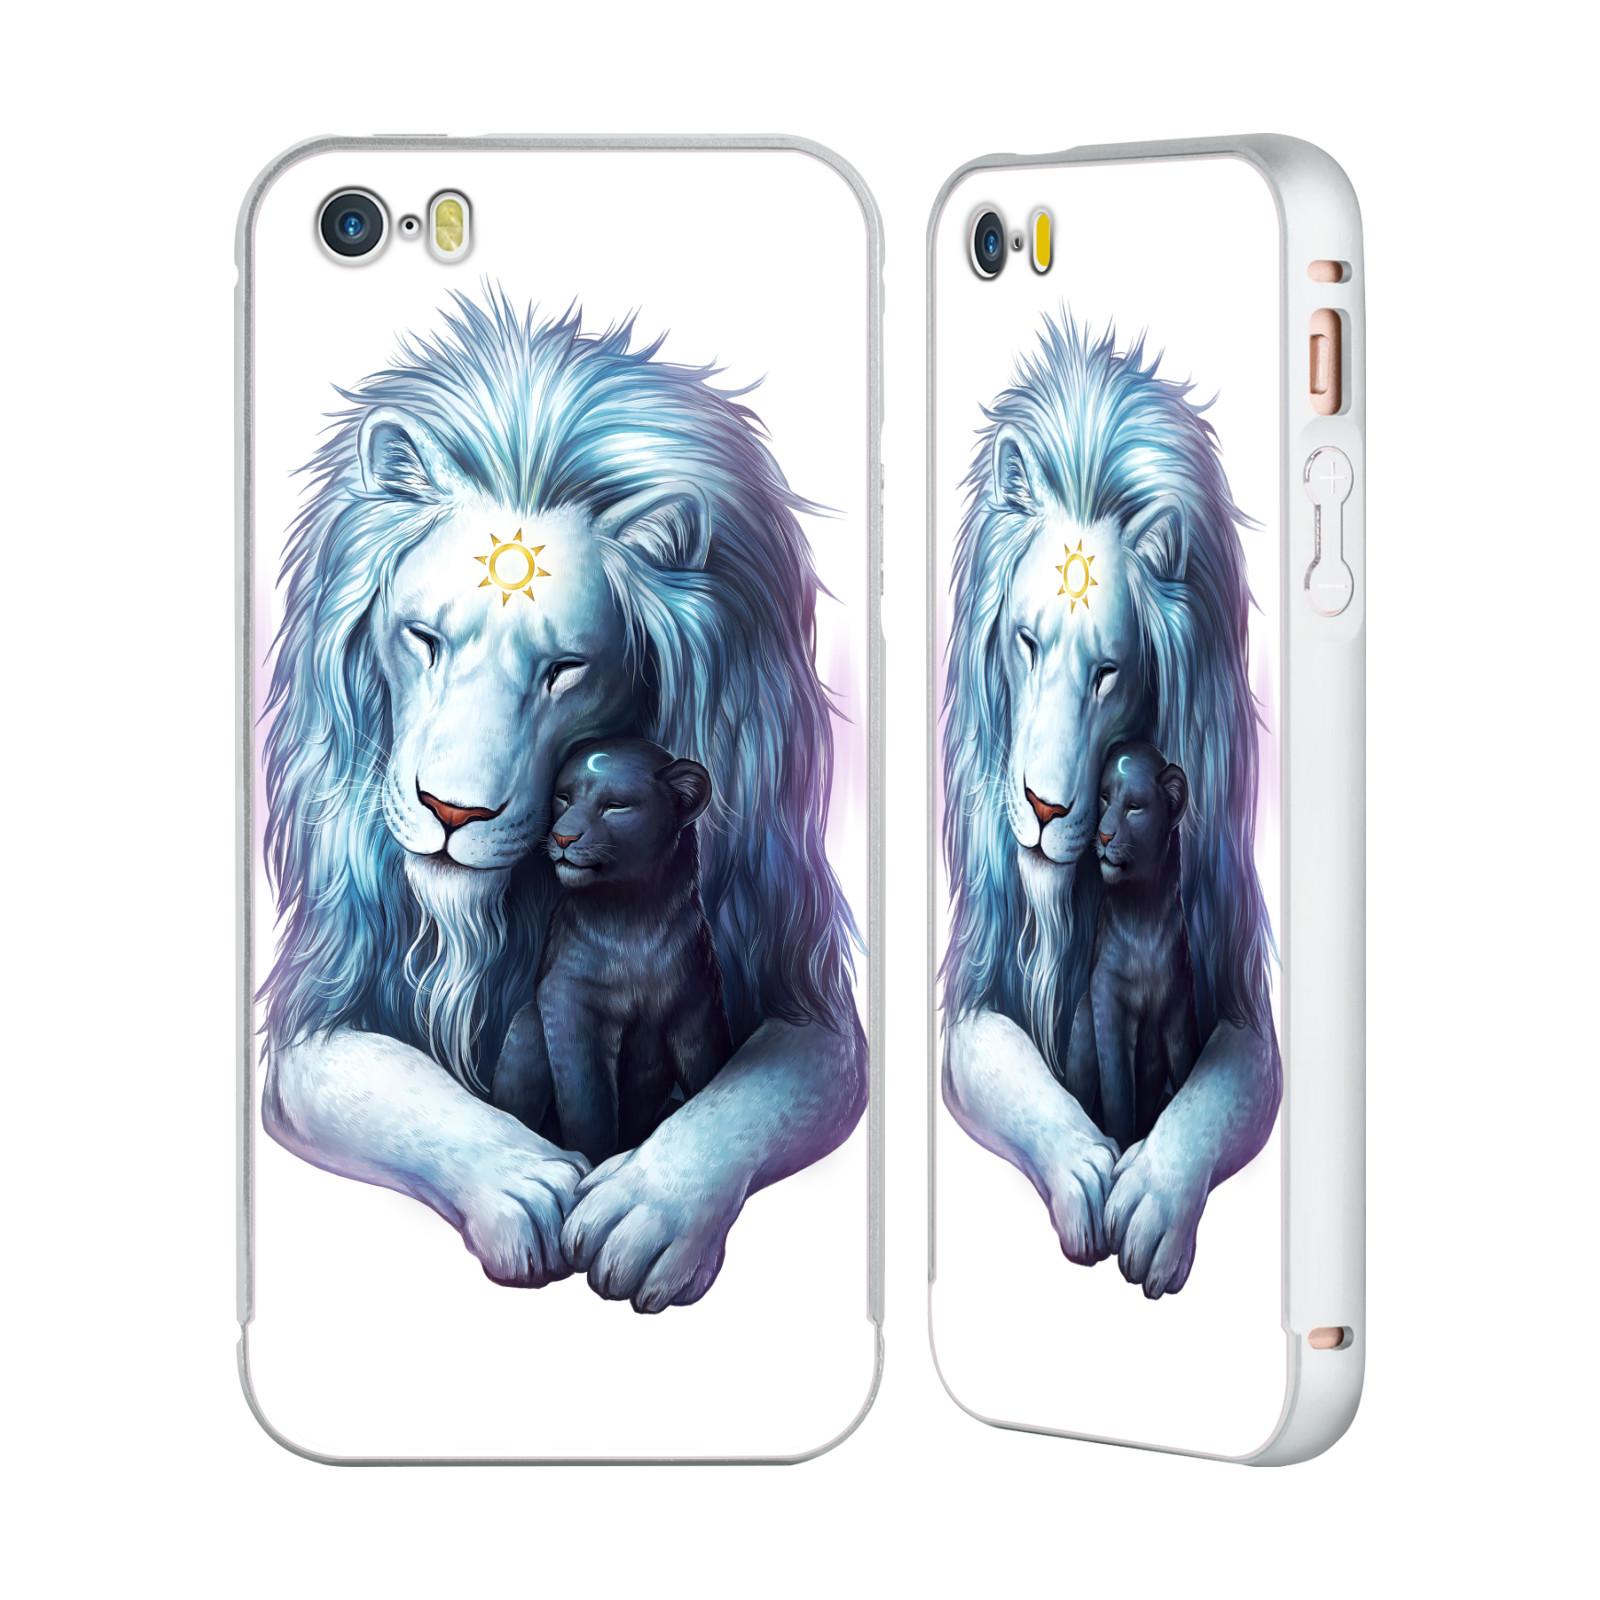 JONAS-034-JOJOESART-034-JODICKE-WILDLIFE-2-SILVER-SLIDER-CASE-FOR-APPLE-iPHONE-PHONES